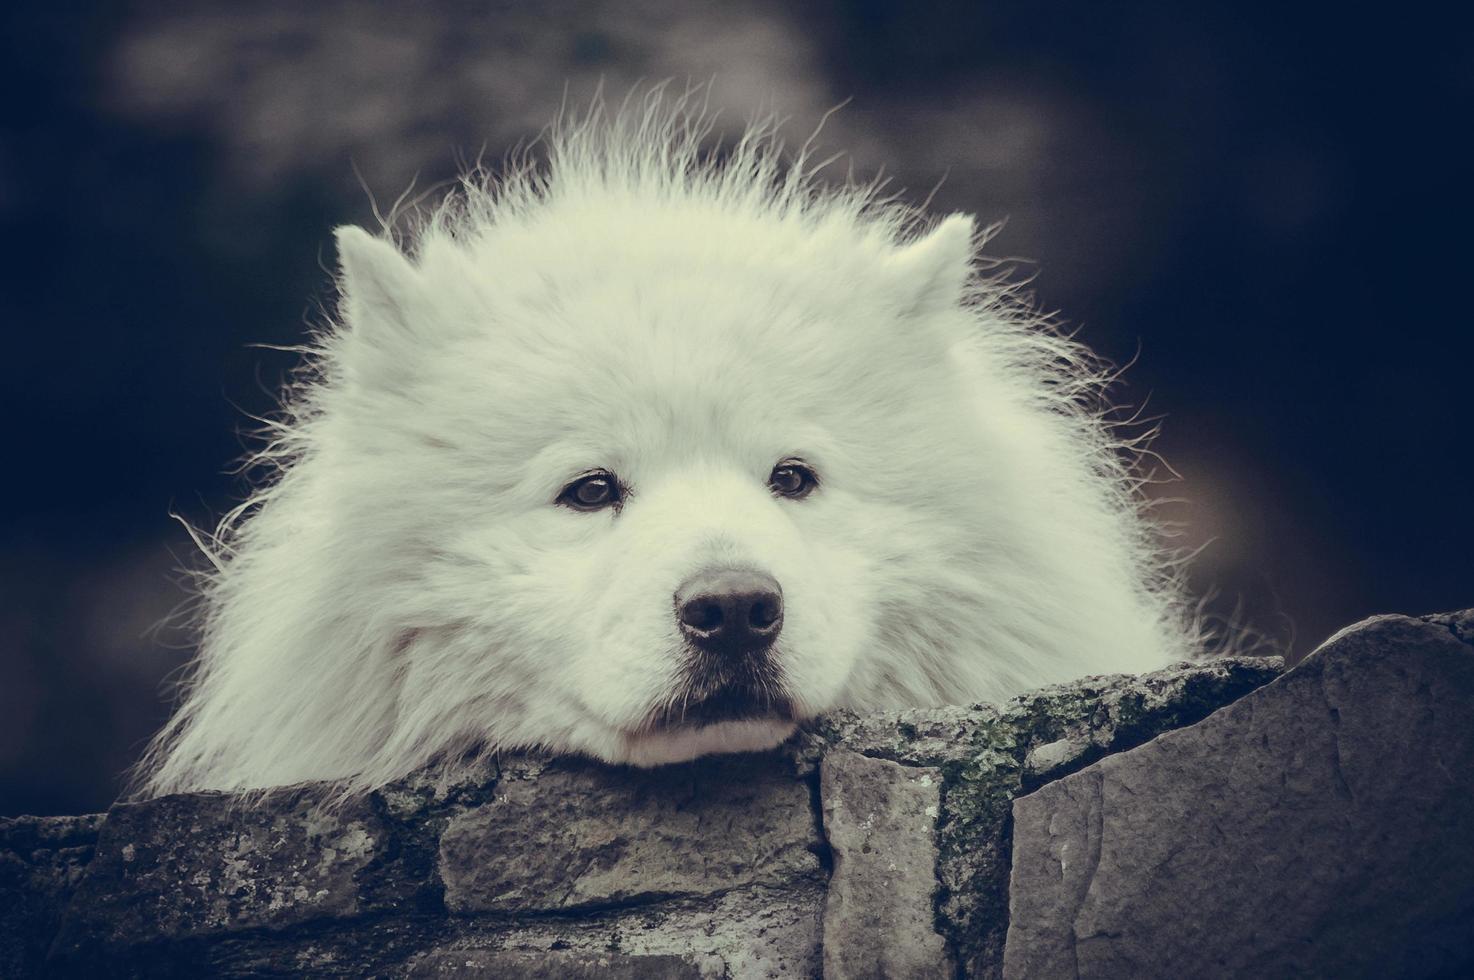 traurig aussehender samoyed Welpe foto